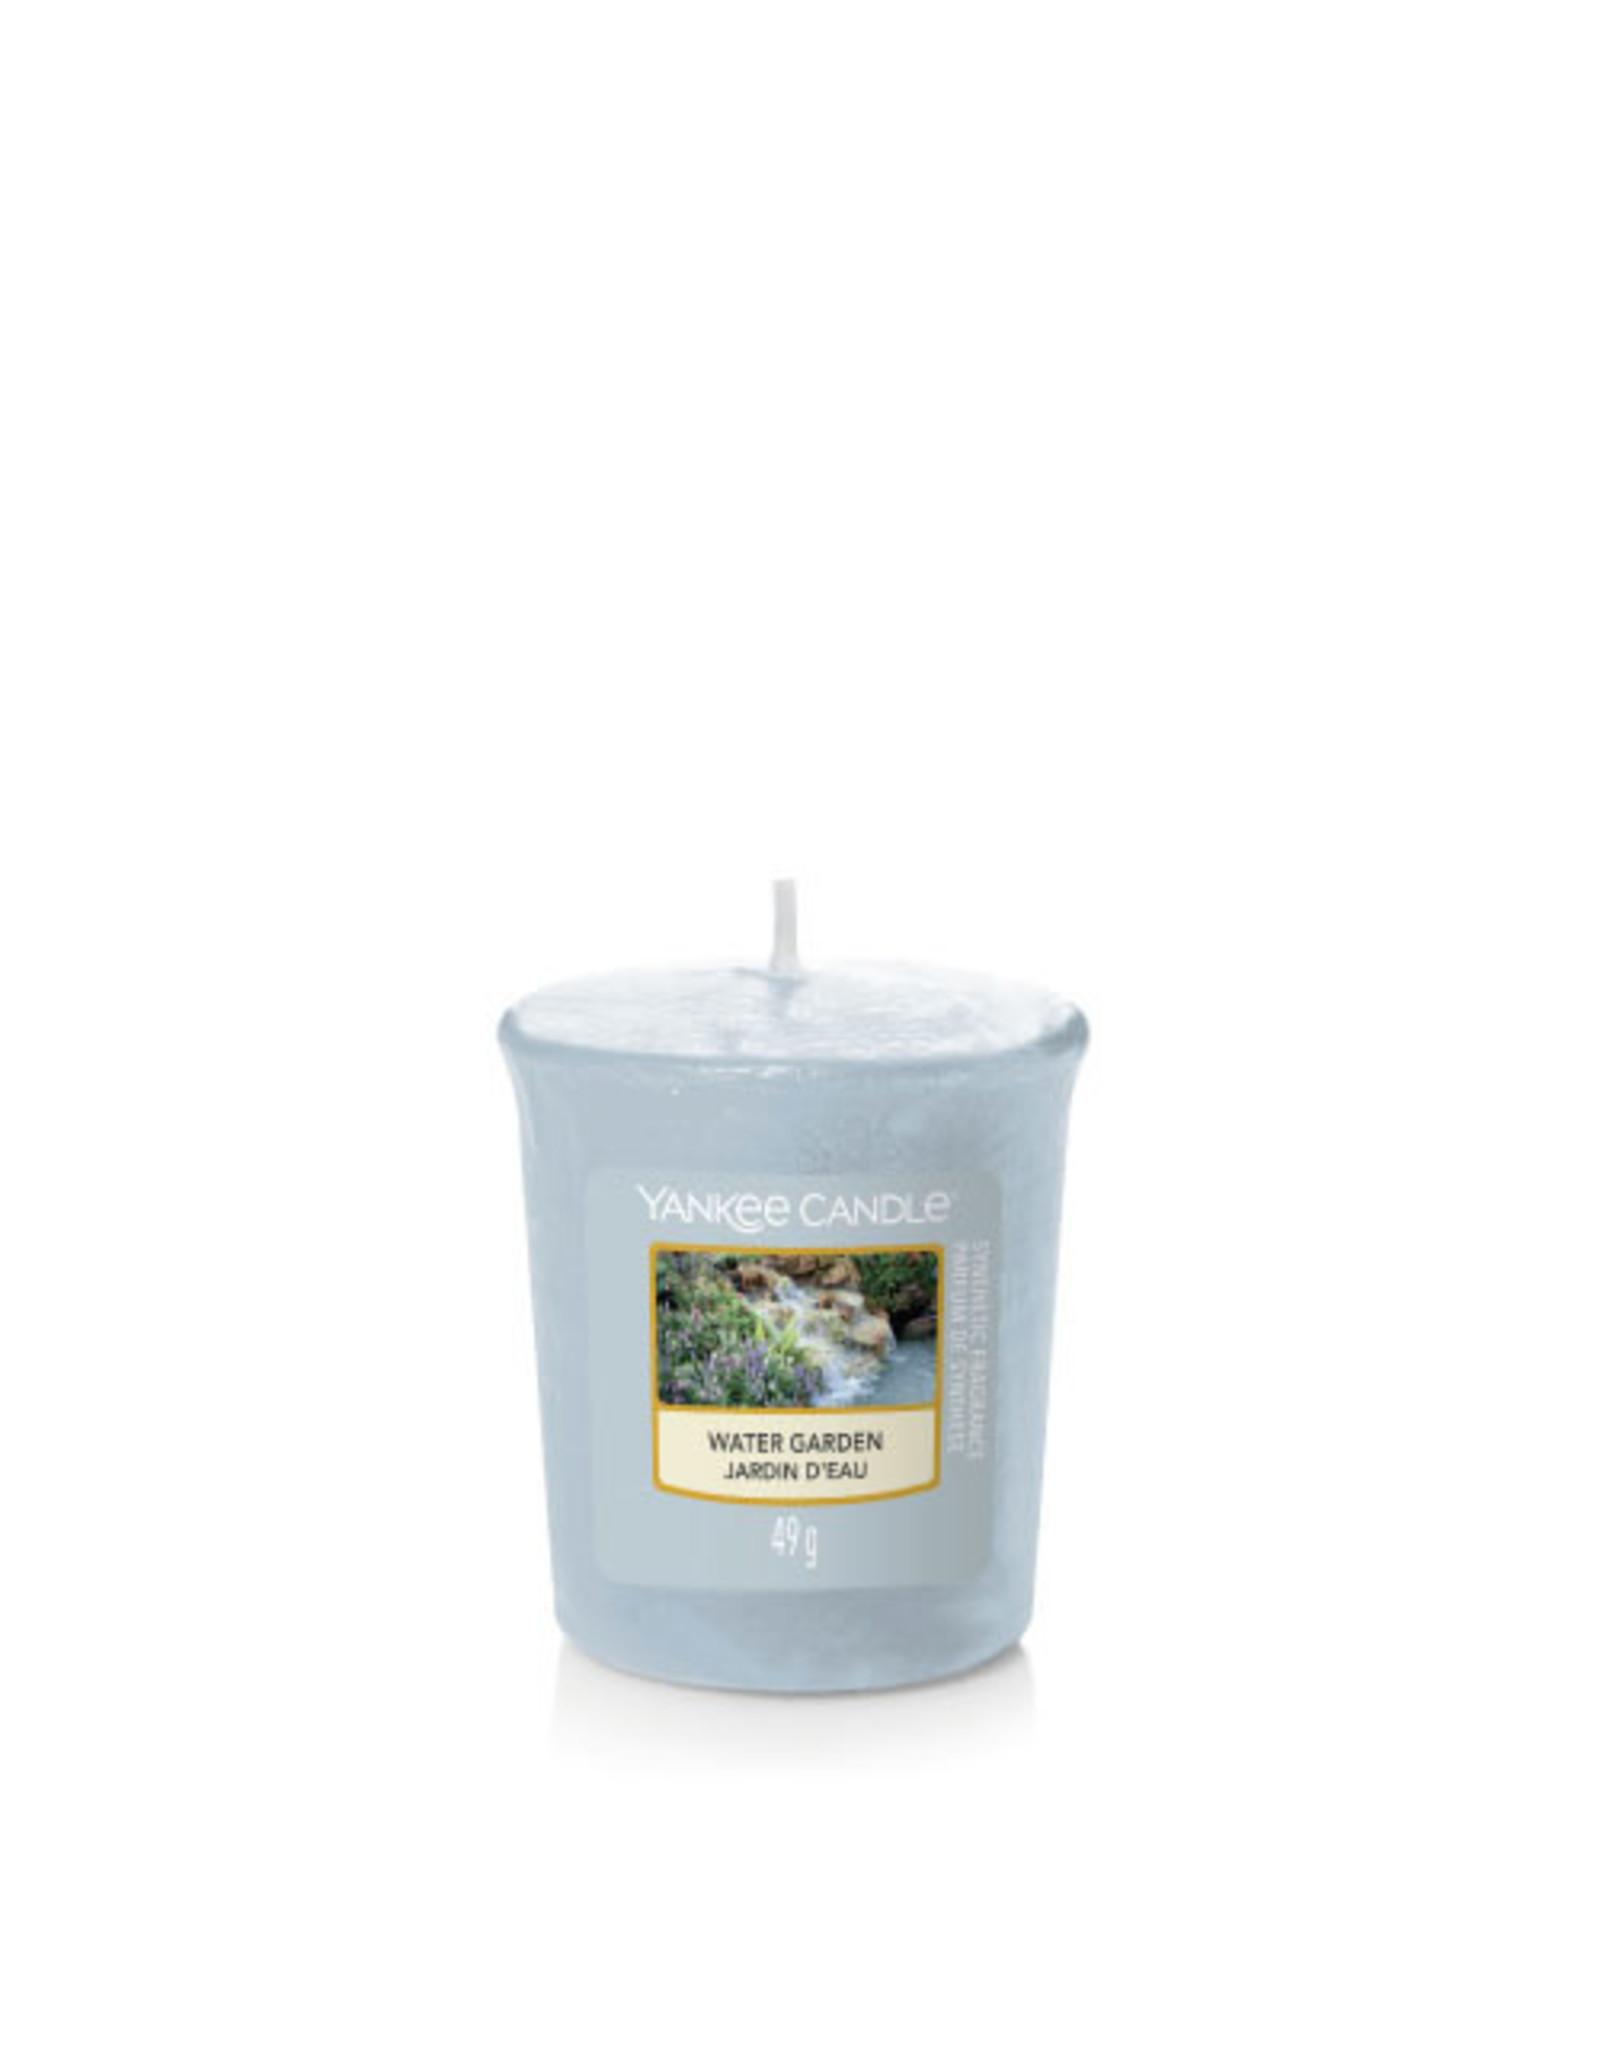 Yankee Candle Water Garden Yankee Candle